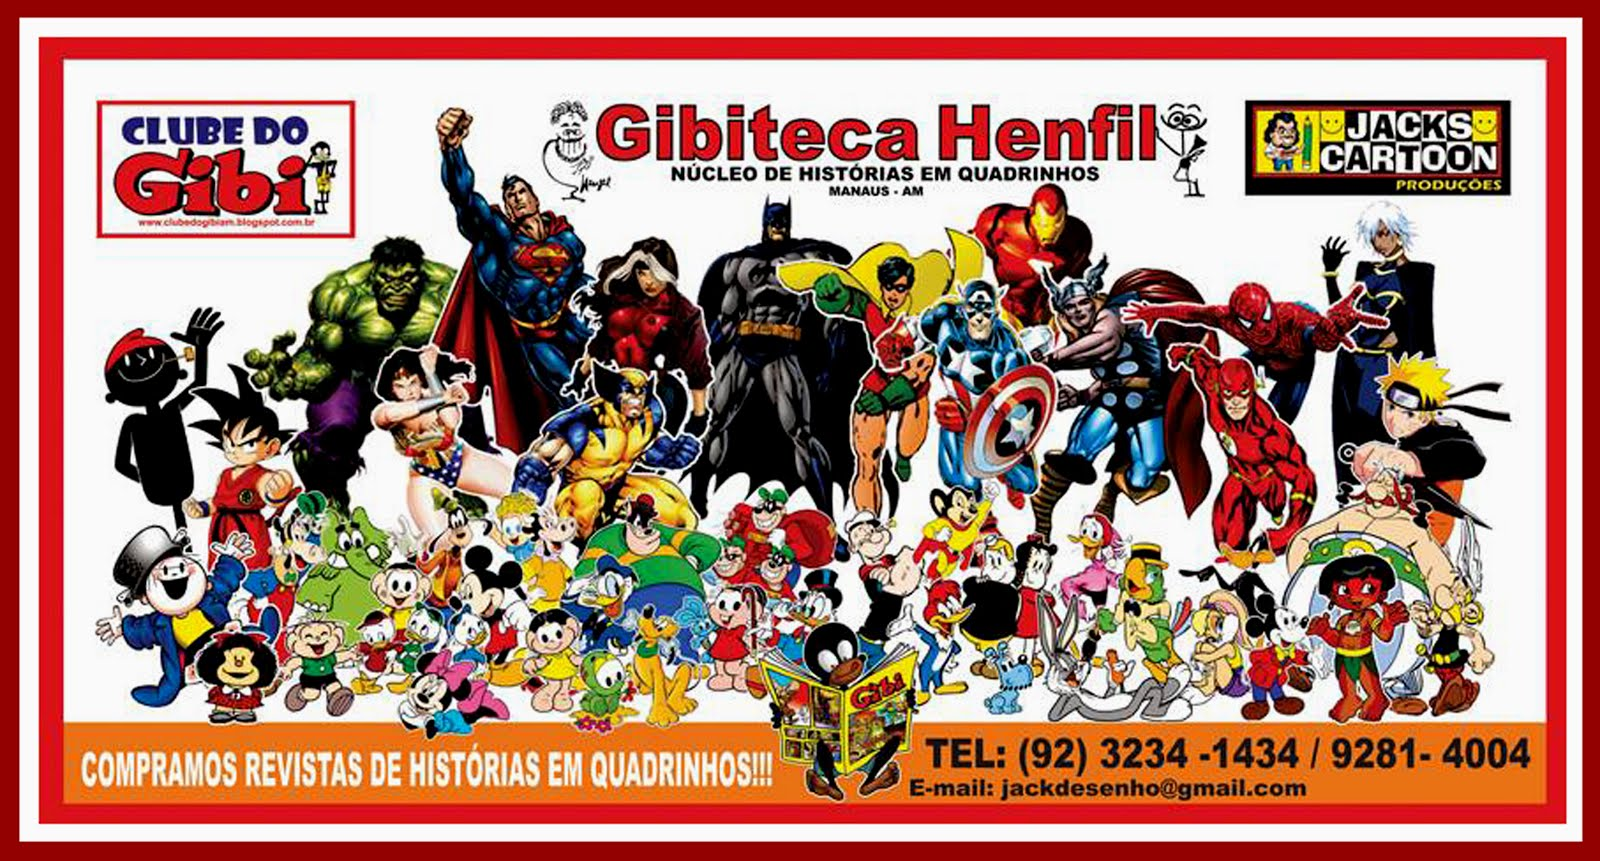 GIBITECA HENFIL - Manaus Amazonas